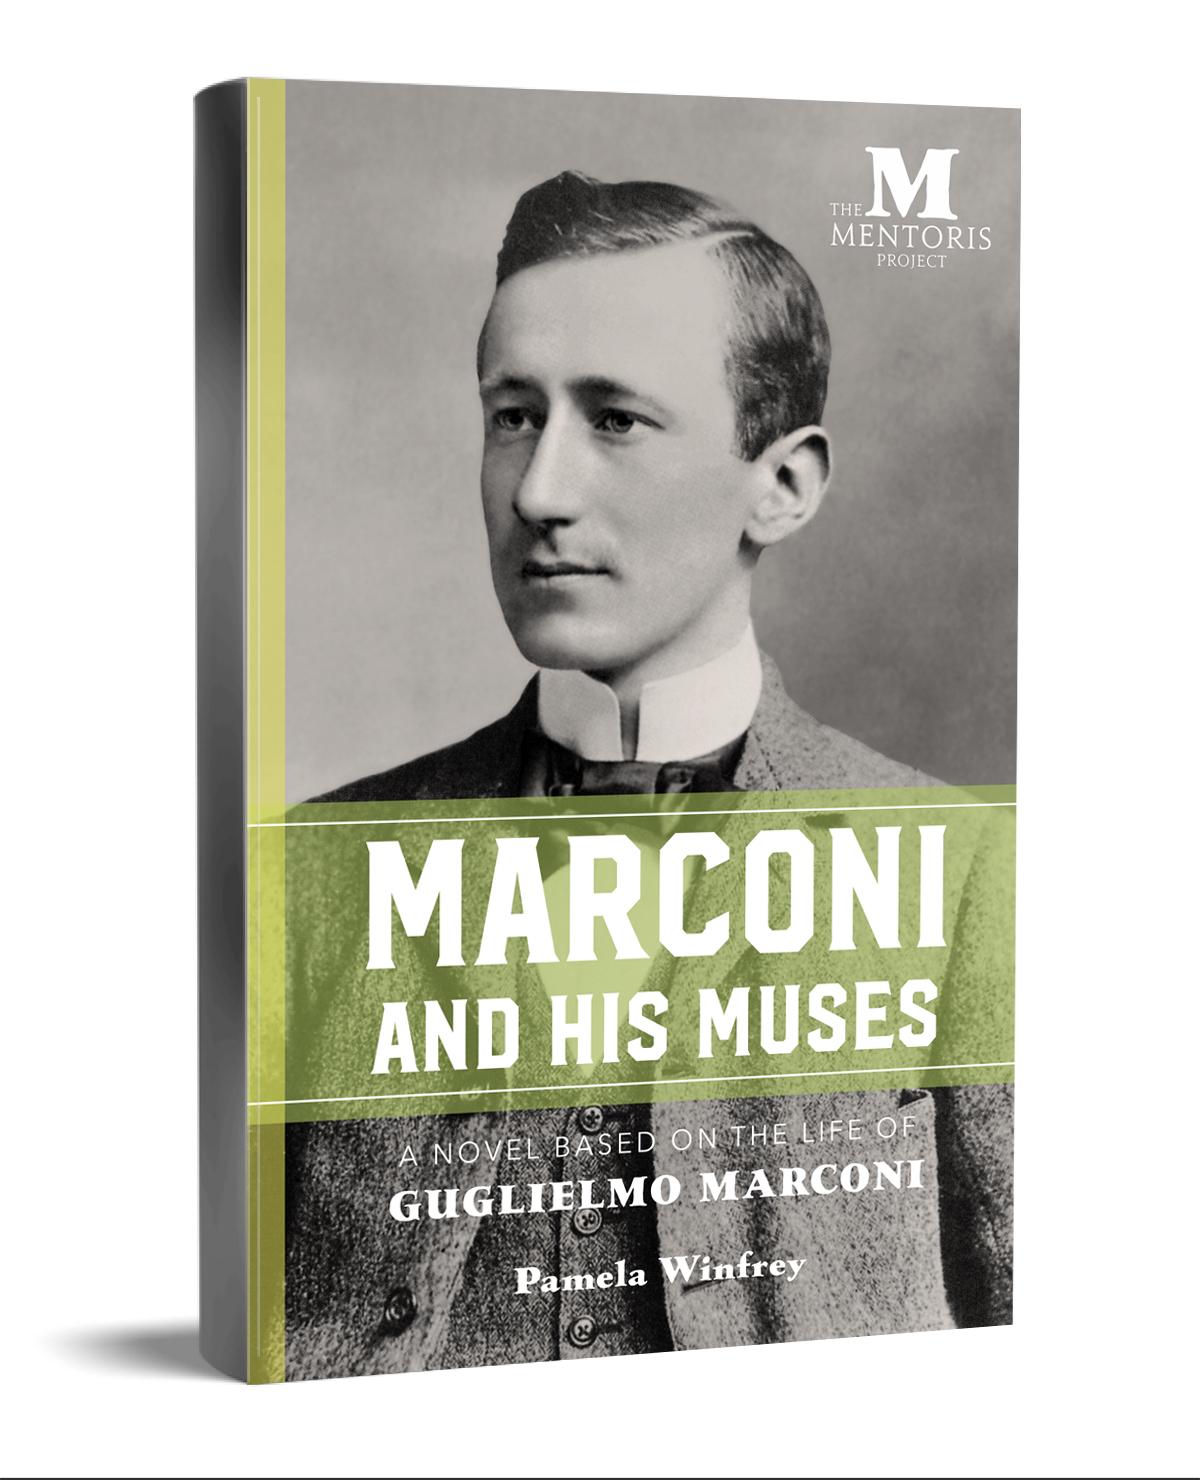 Marconi-Book-Icon.jpg